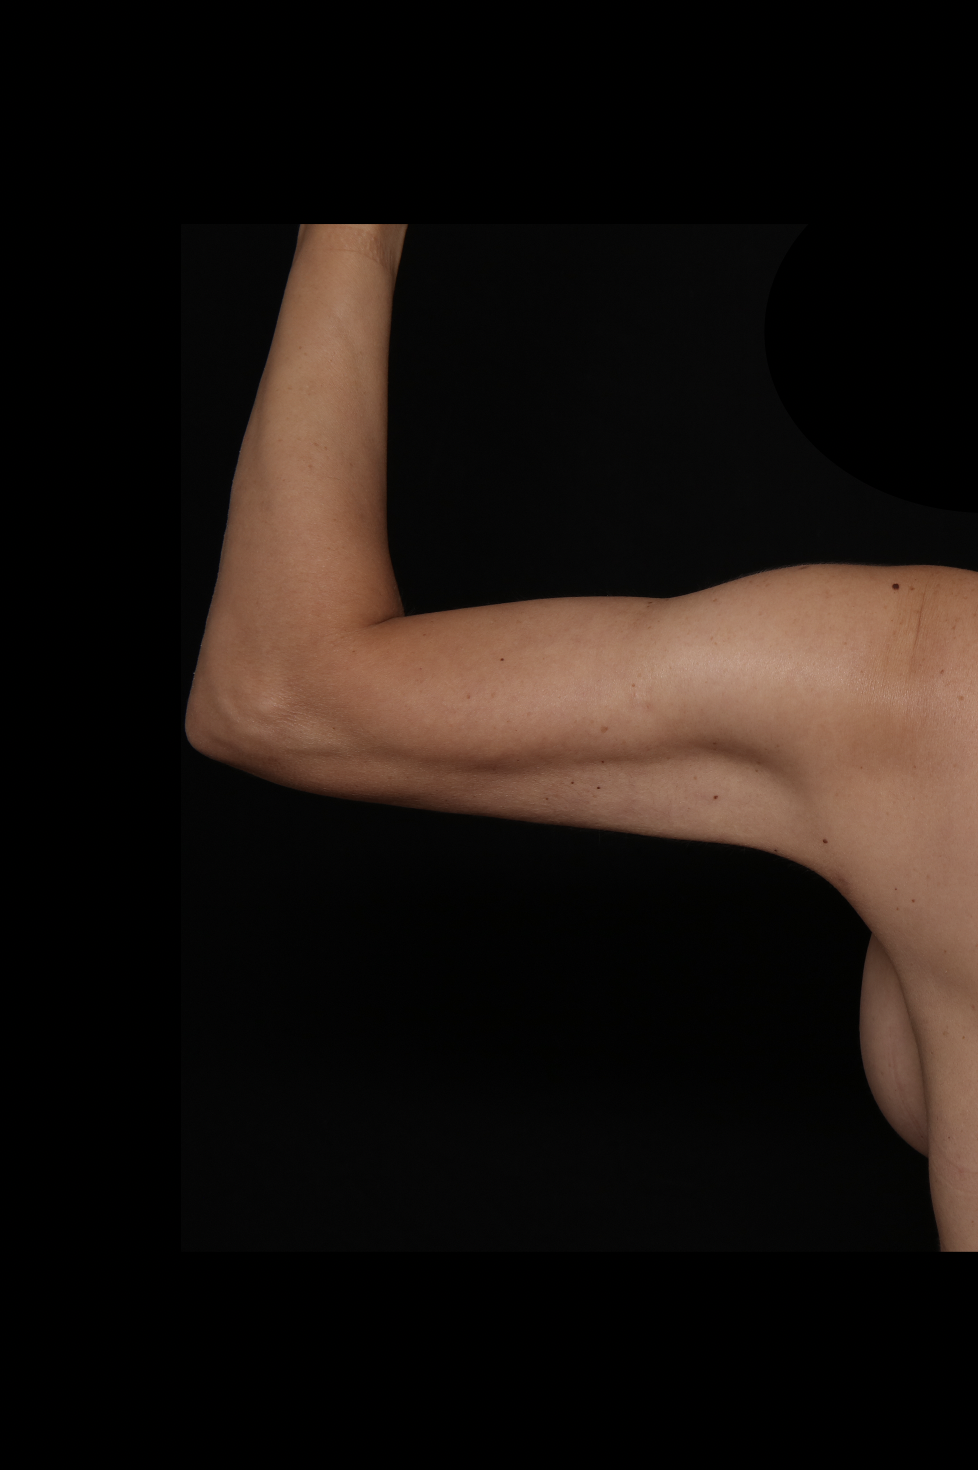 After Arm Procedure - Arm Liposuction & Magic Tight®